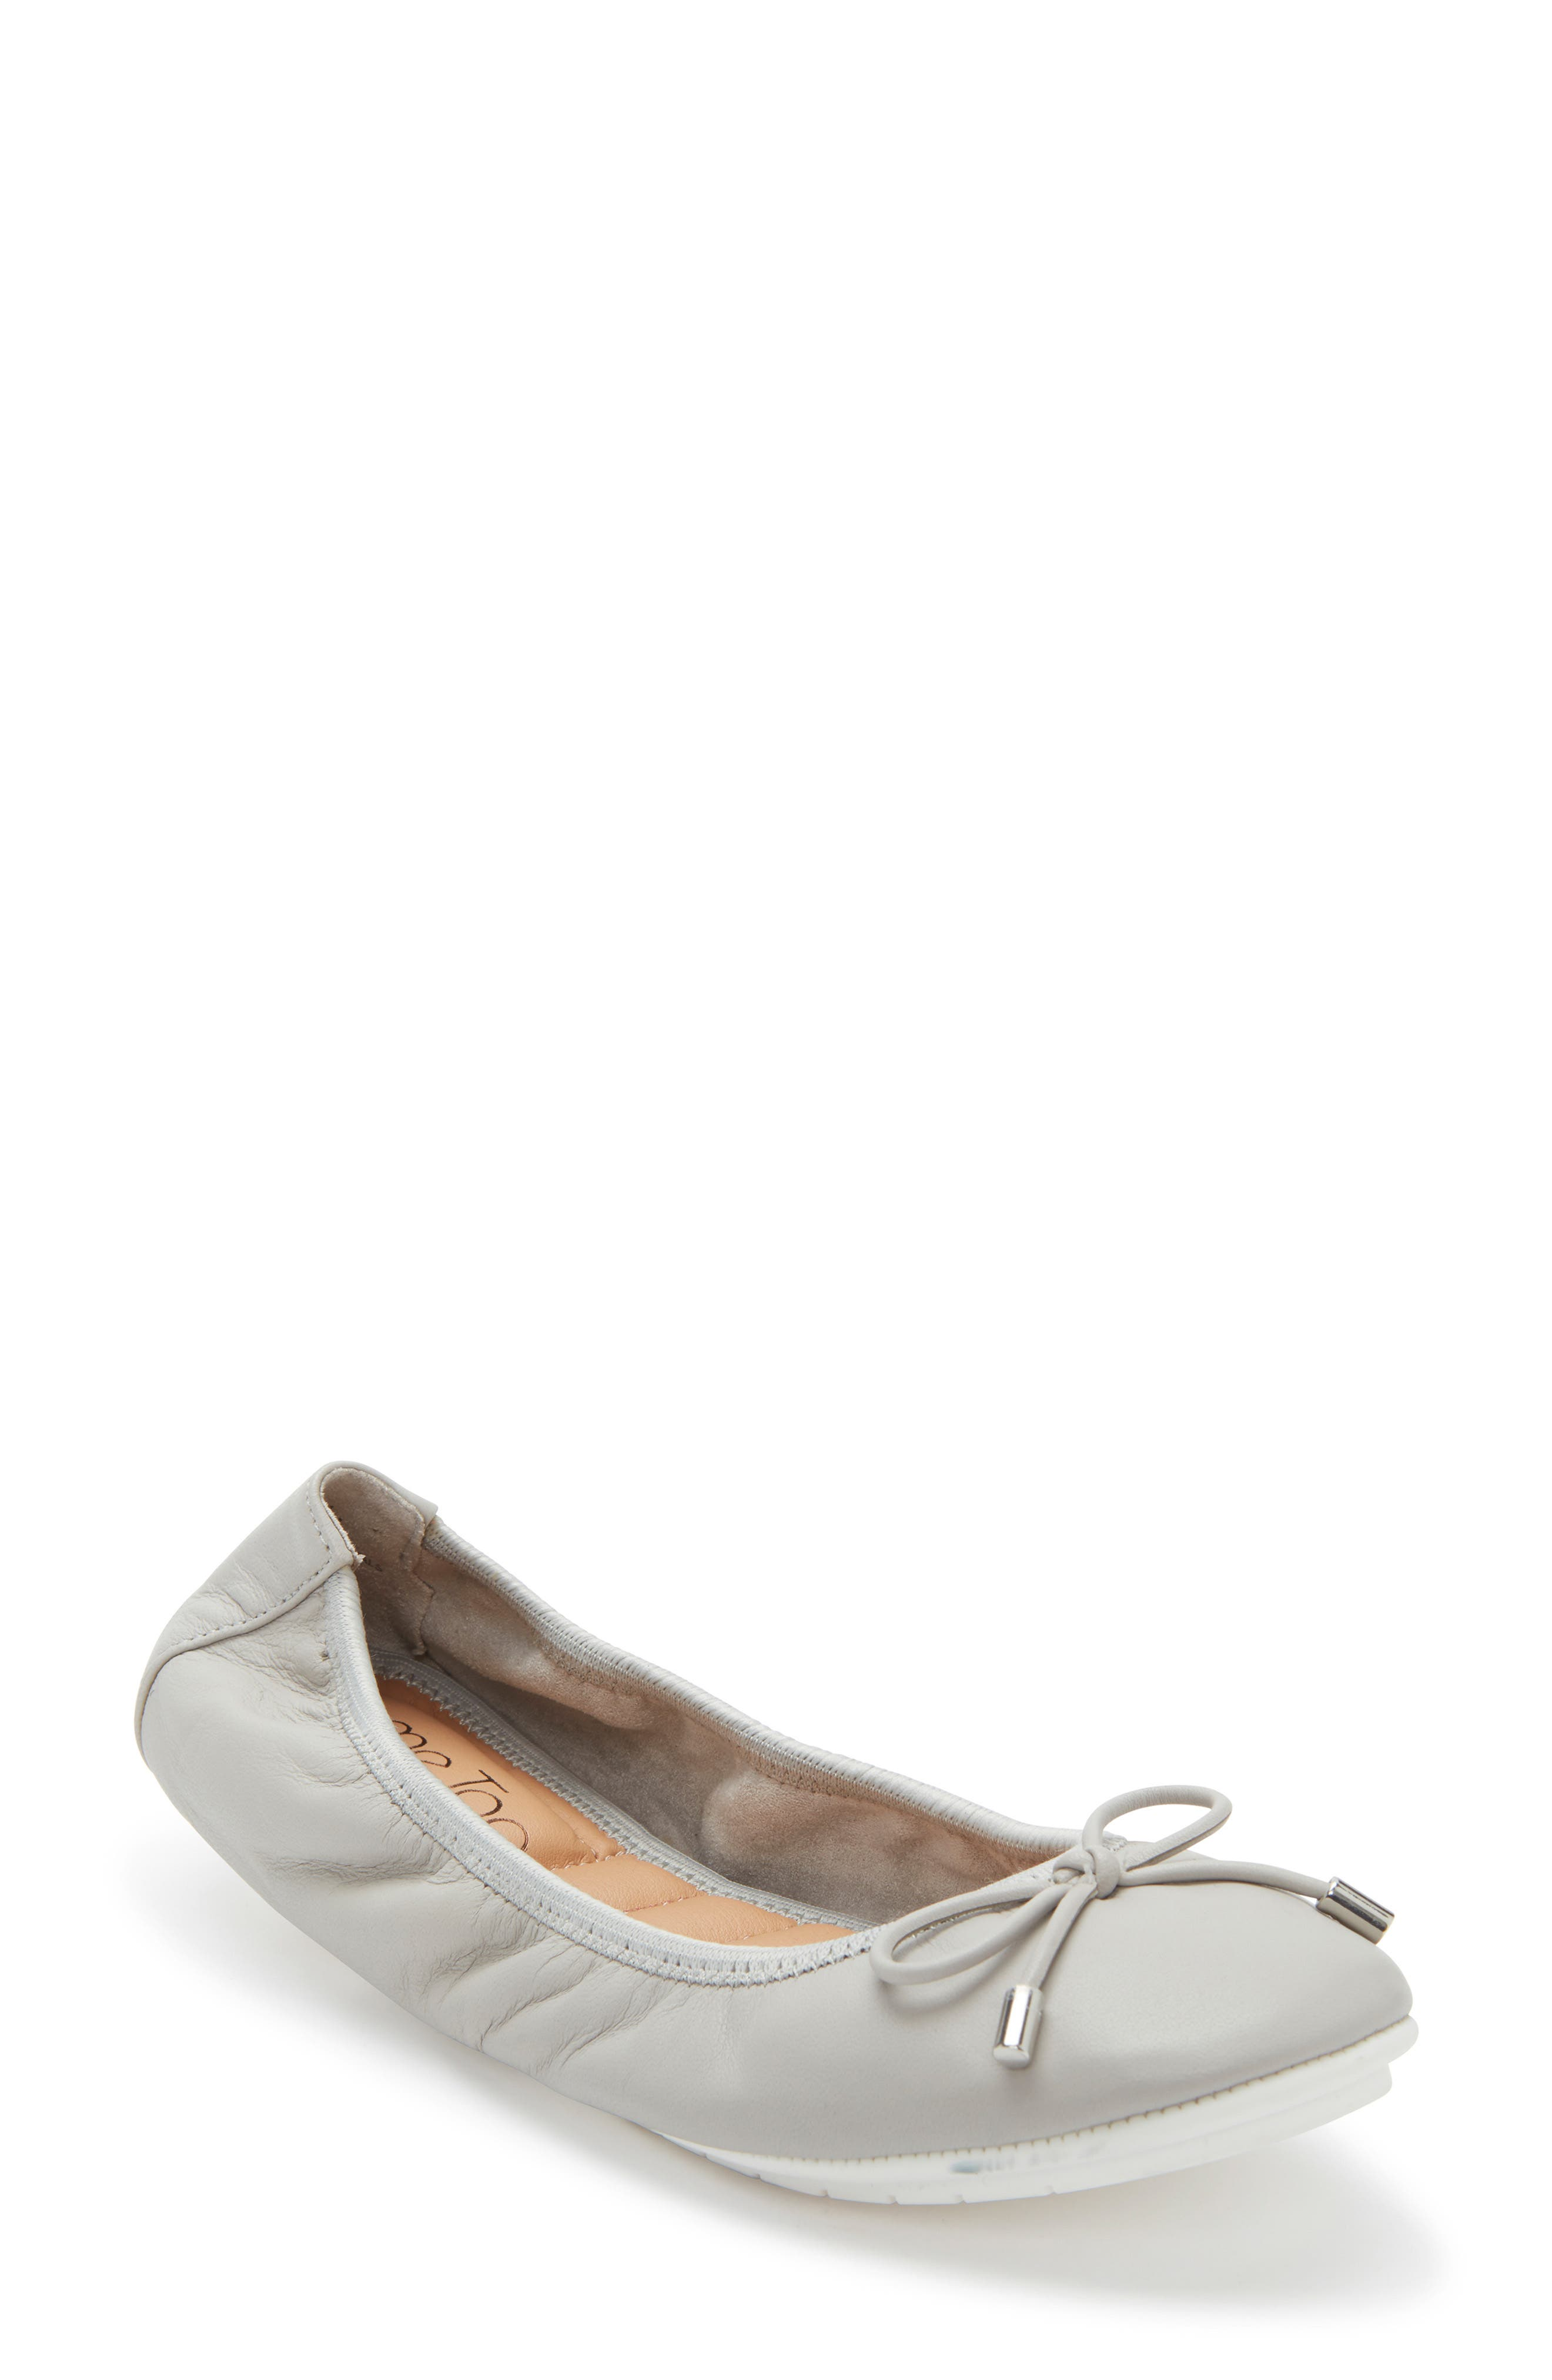 'Halle 2.0' Ballet Flat, Main, color, LIGHT GREY LEATHER